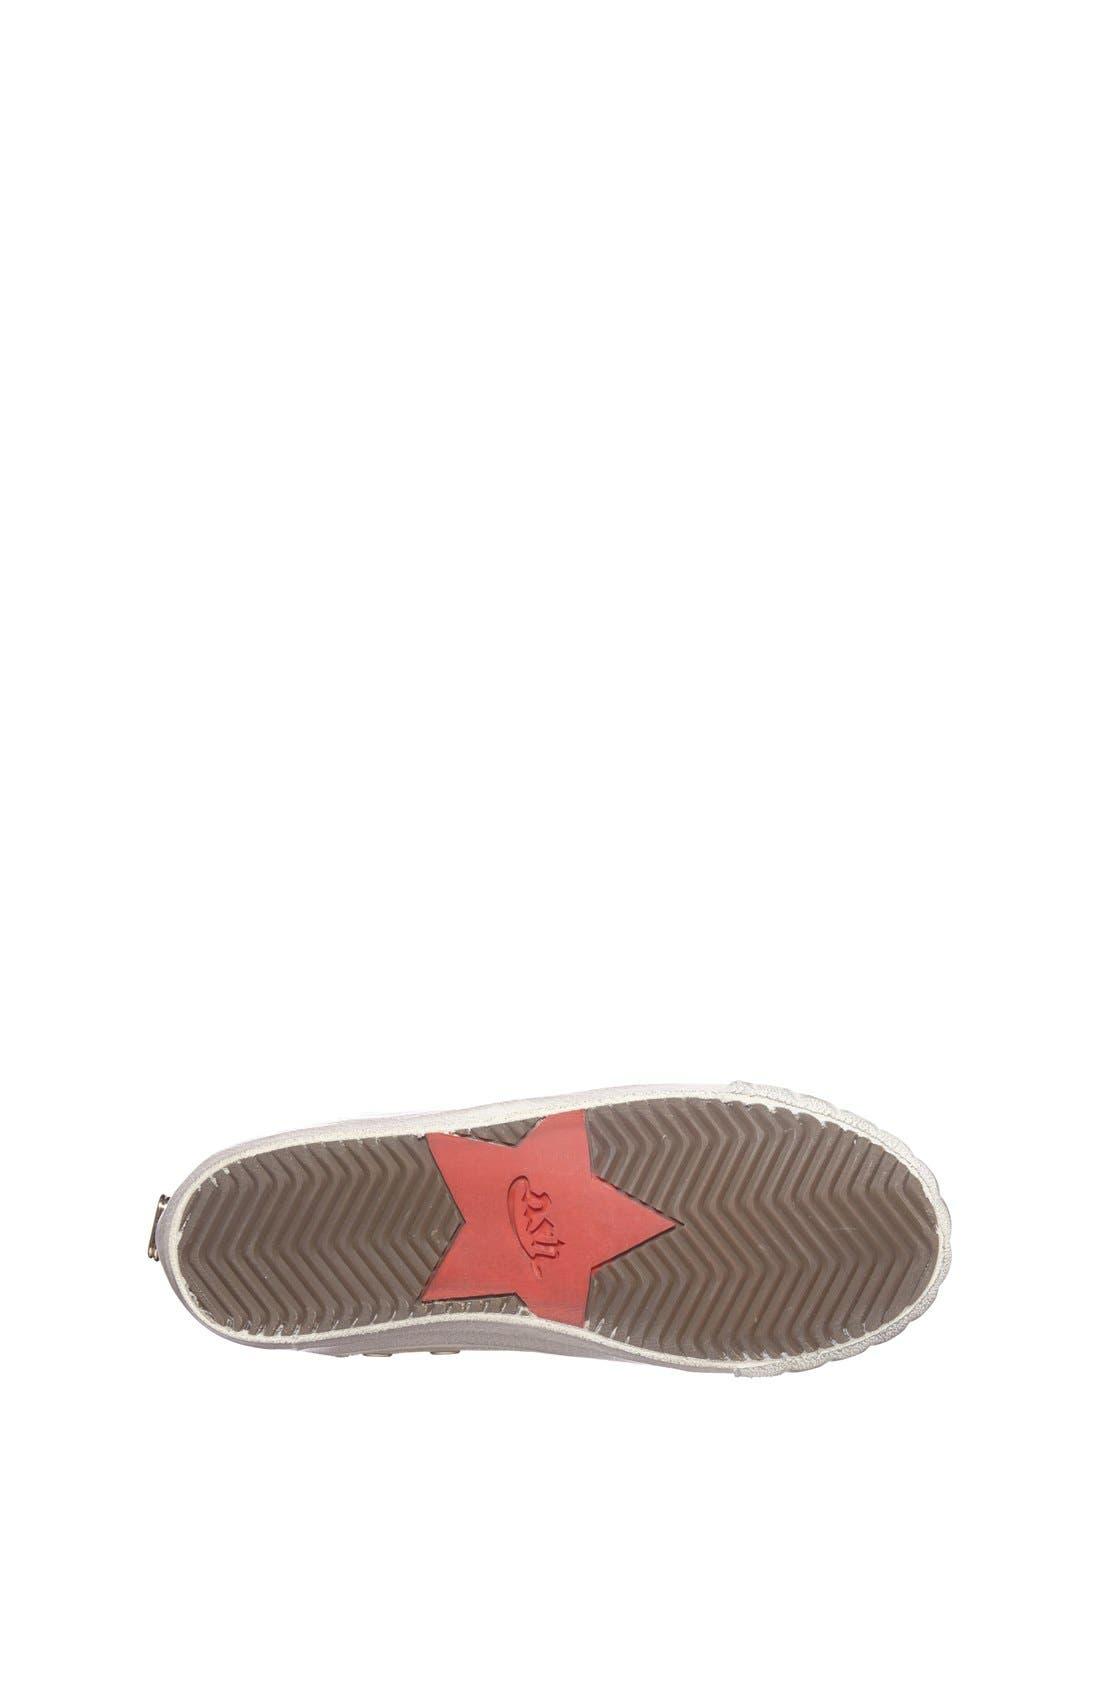 Alternate Image 4  - Ash 'Candy' Sneaker (Little Kid & Big Kid)